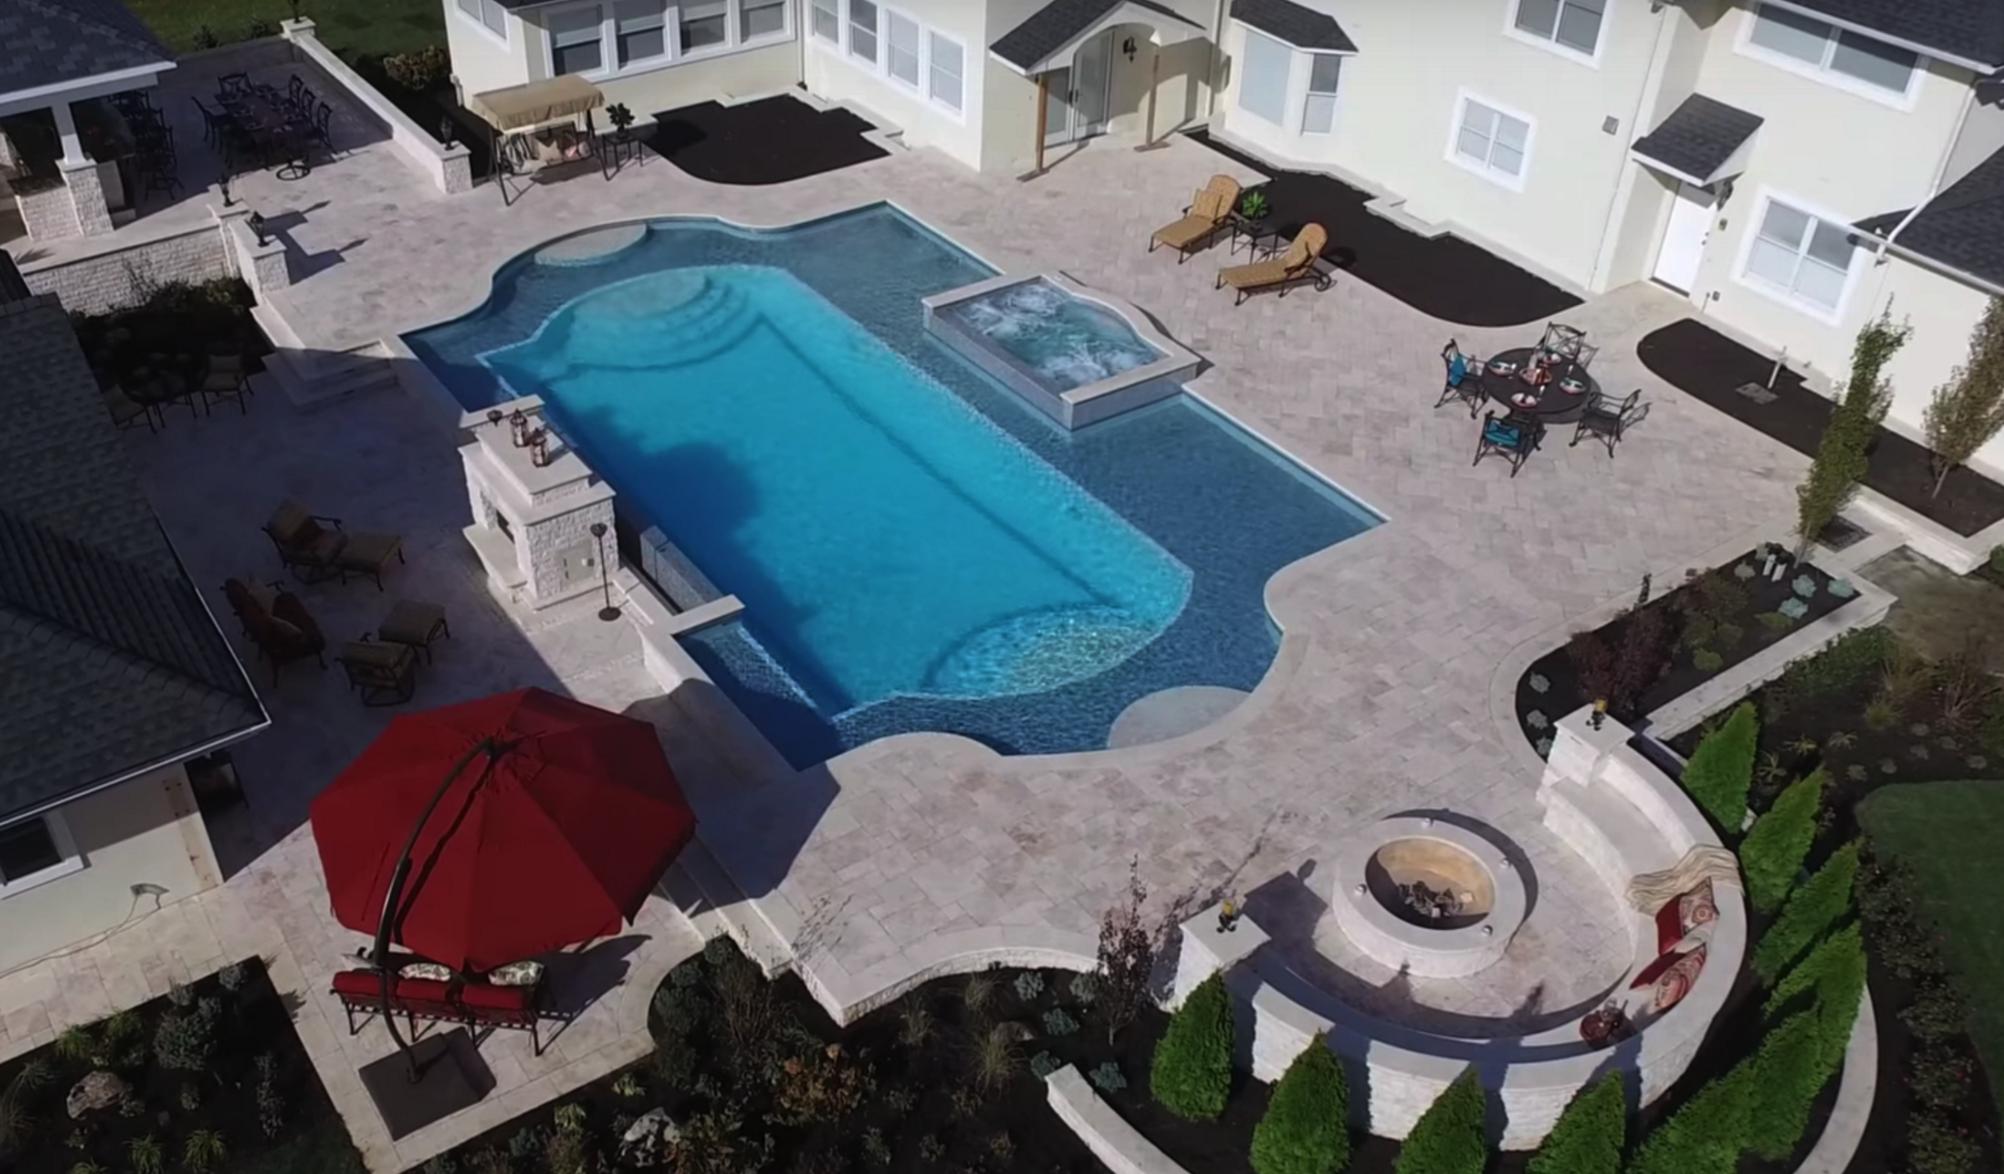 Inground Gunite Swimming Pool Design and Installation. Huntington, NY, Long Island, NY custom pool builder.